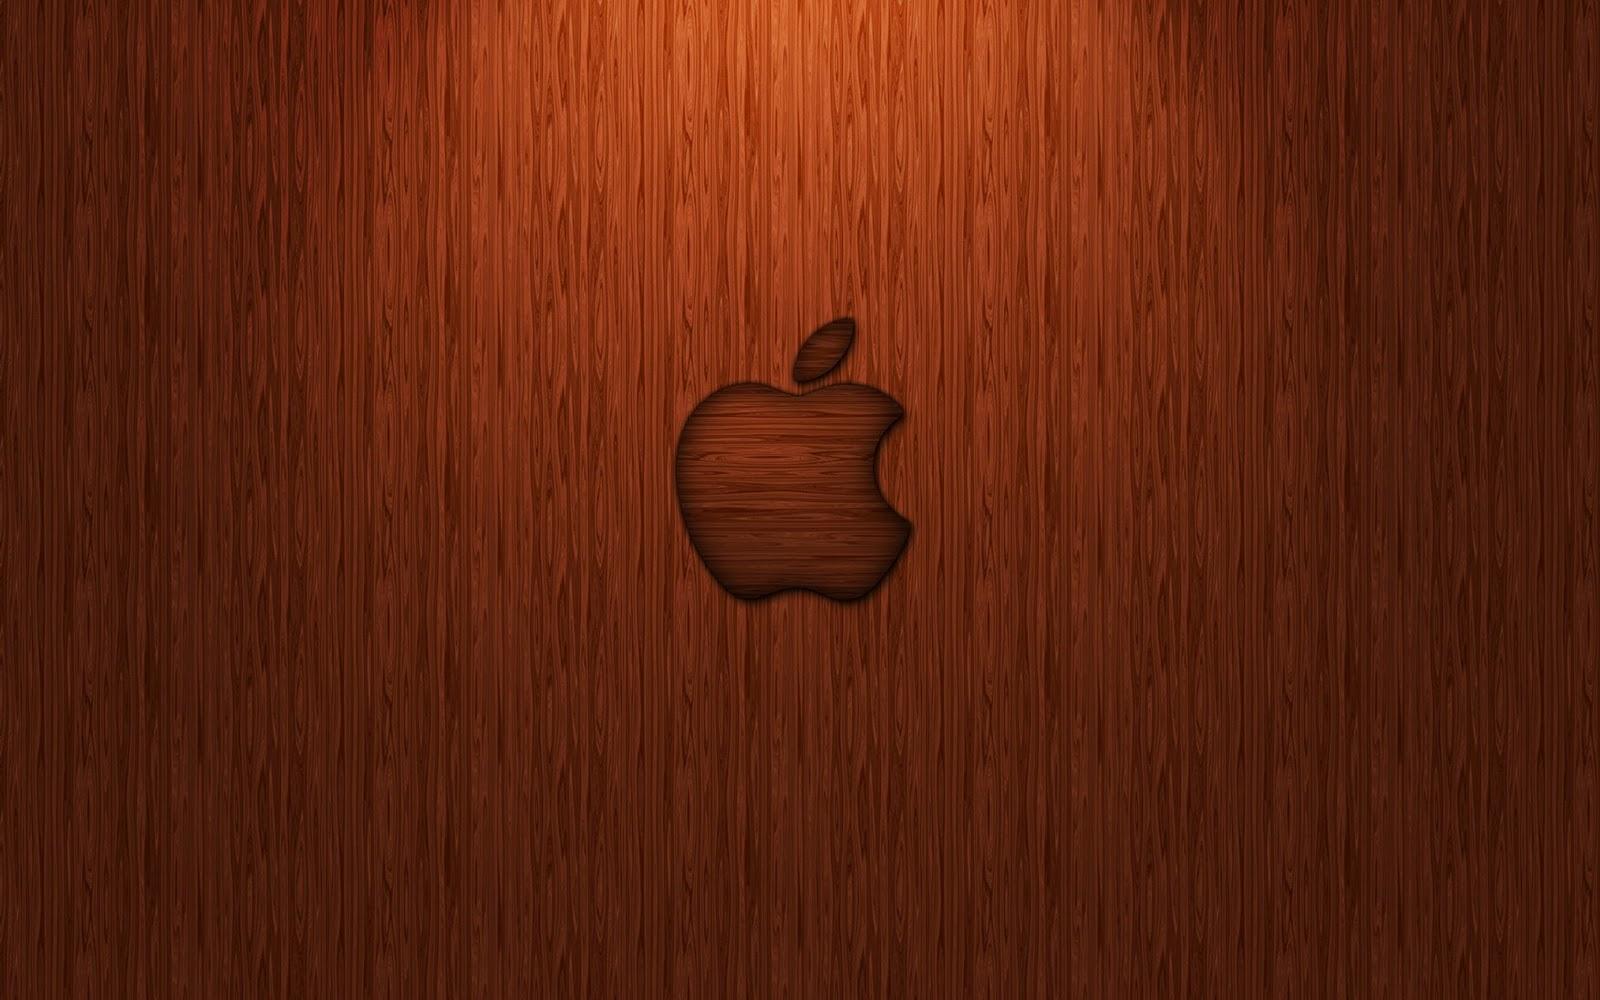 download wood grain wallpaper 15241 1600x1000 px high